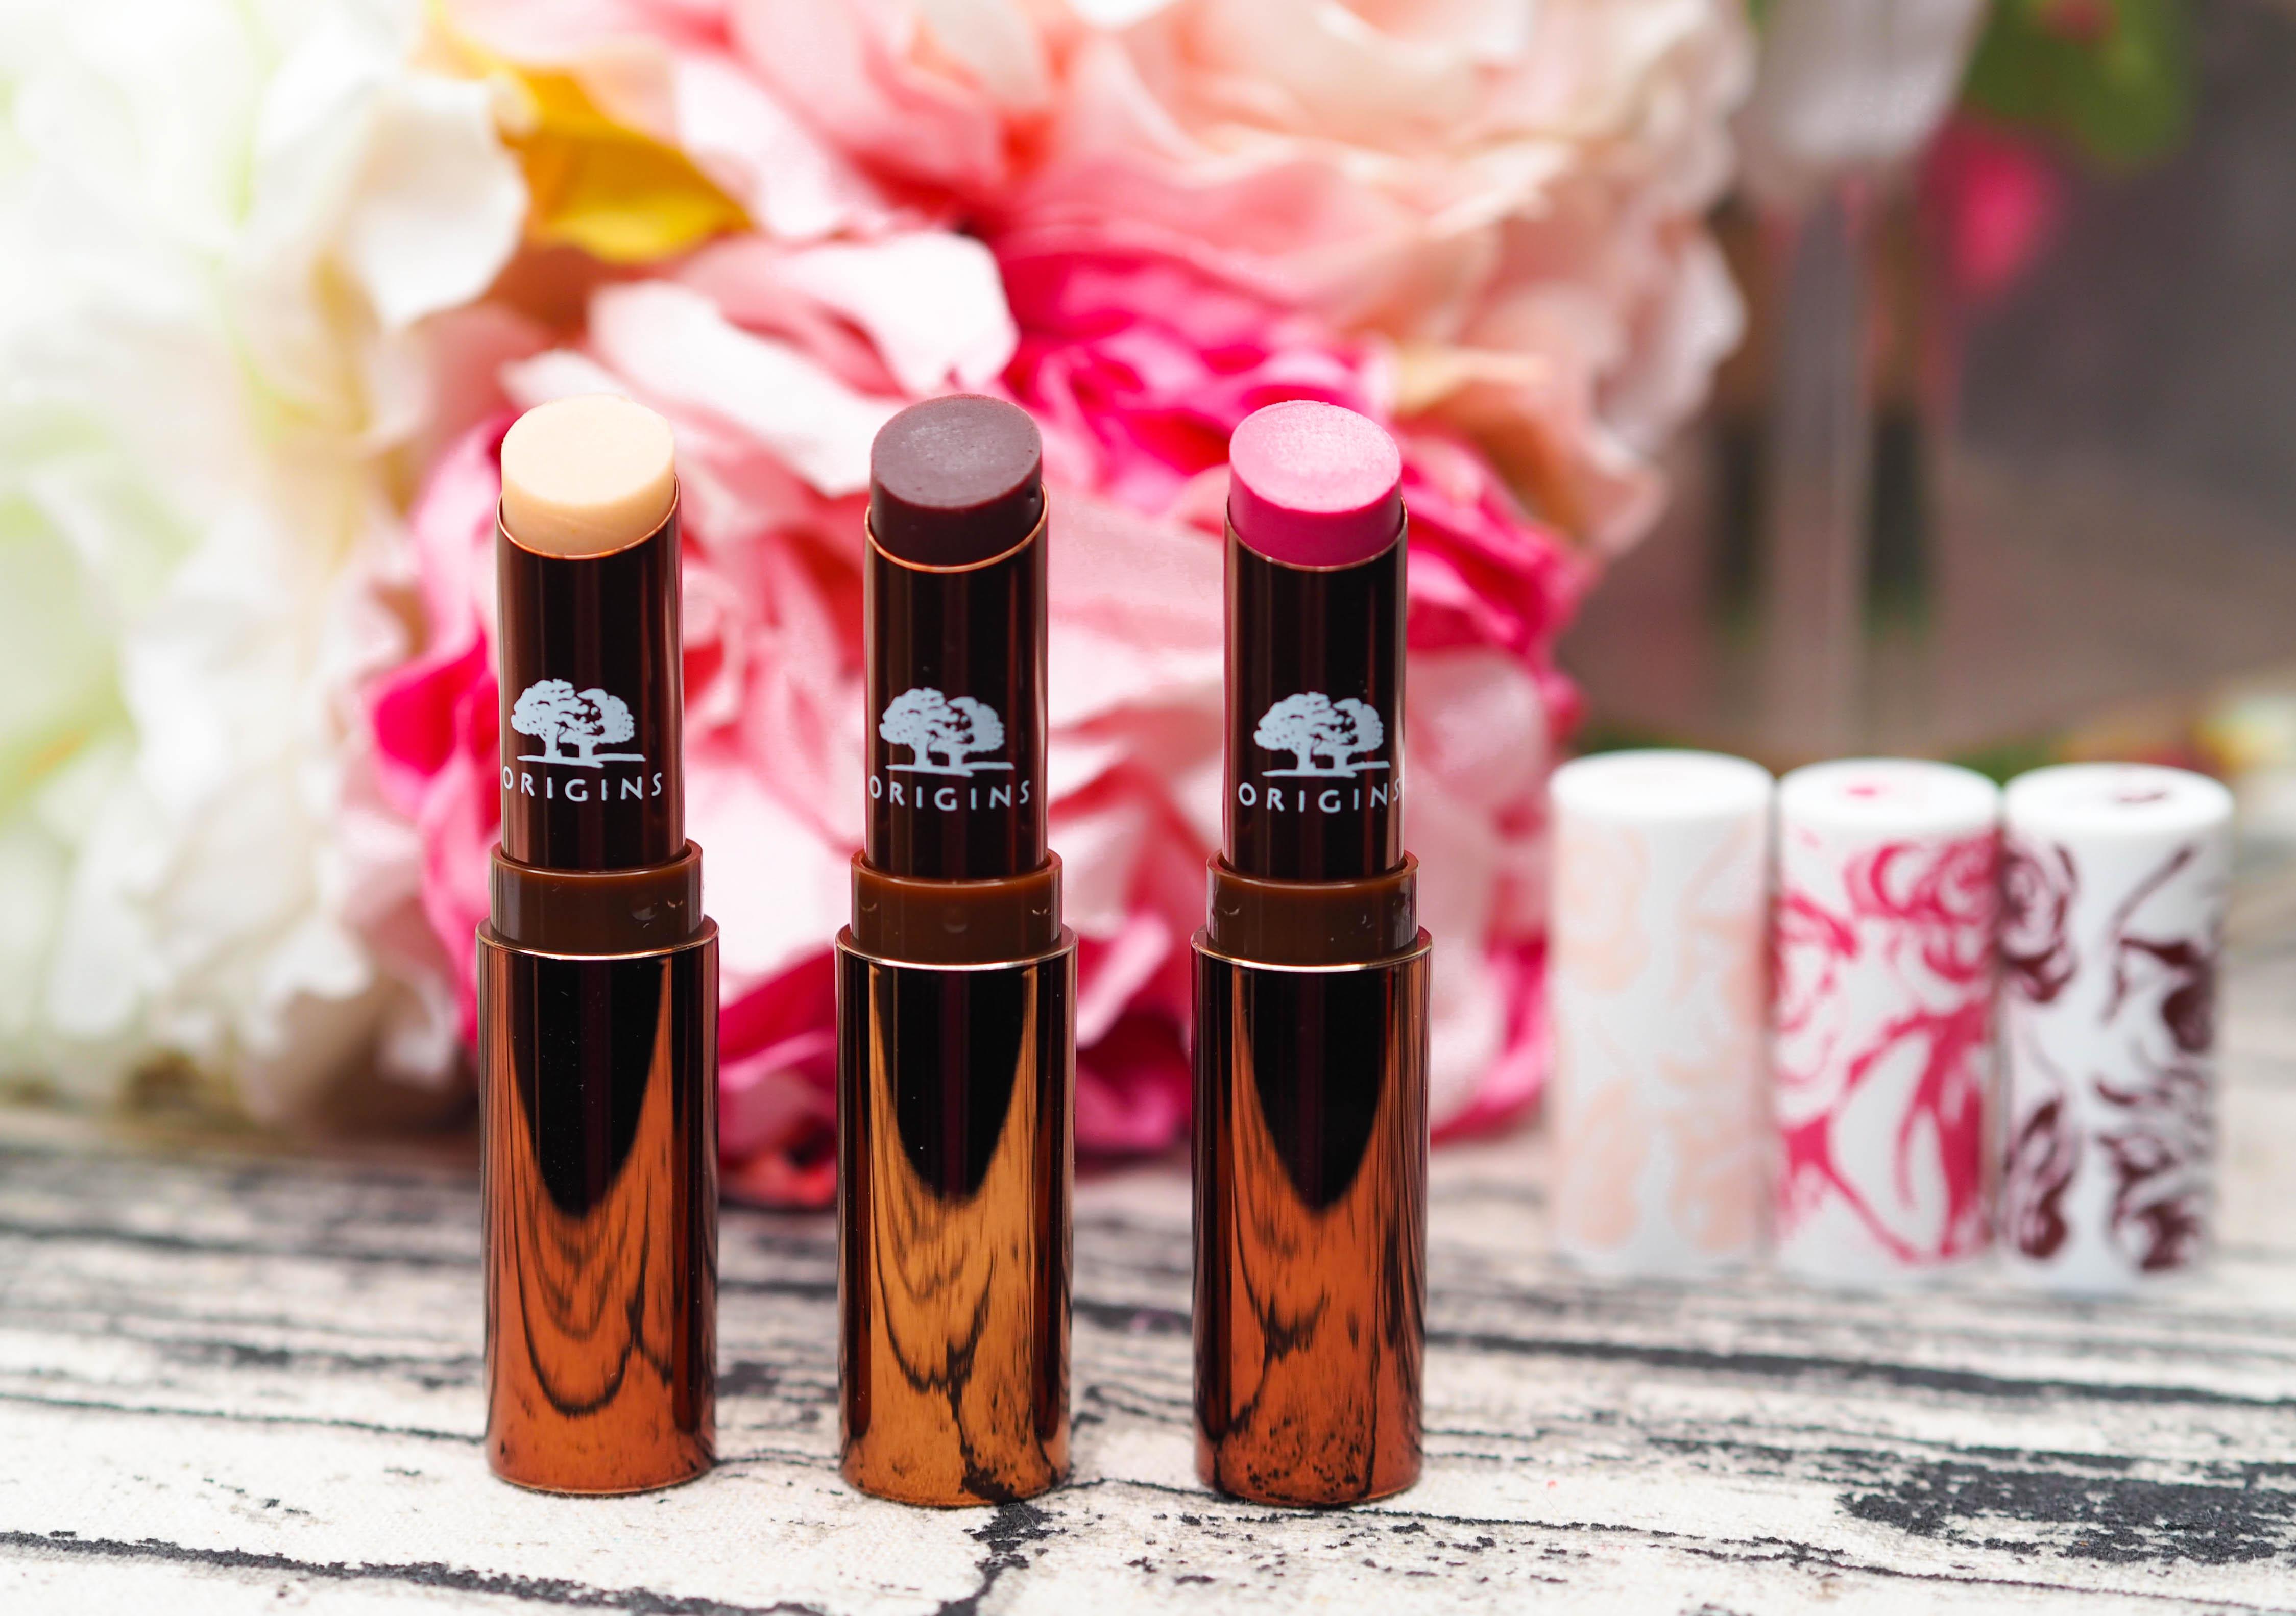 Origins Blooming Sheer Lip Balms